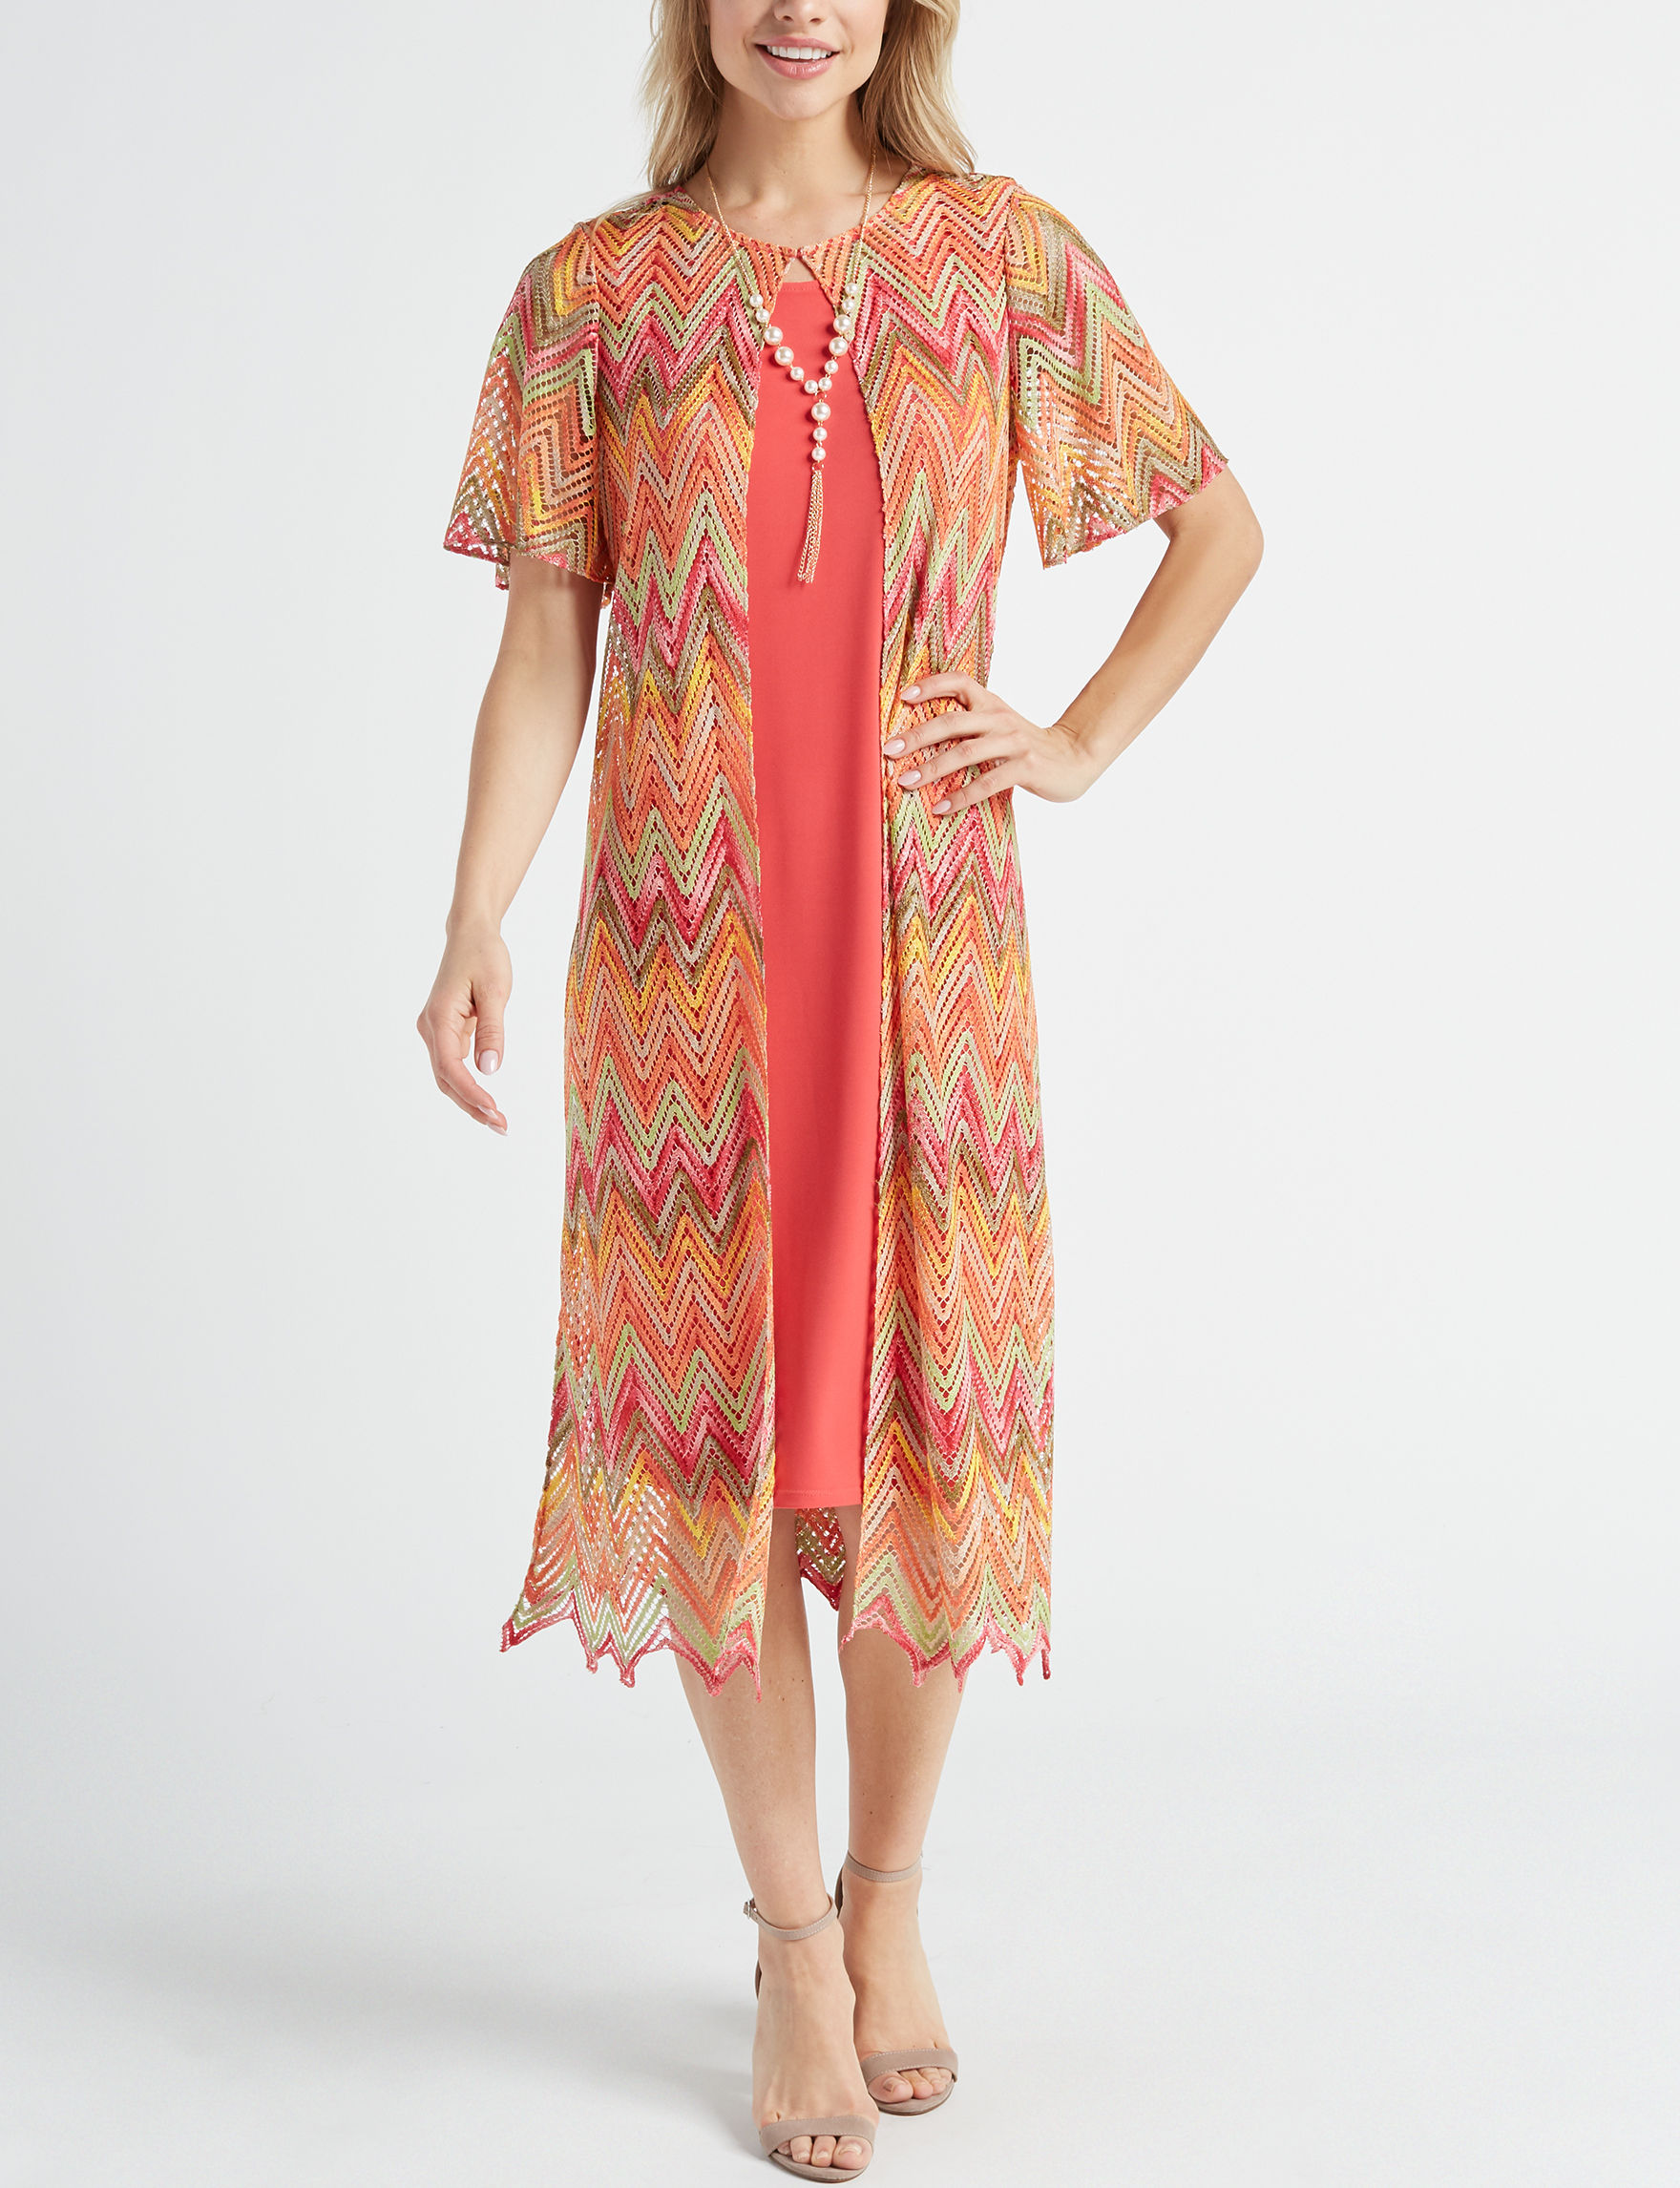 JM Studio Orange Everyday & Casual Jacket Dresses